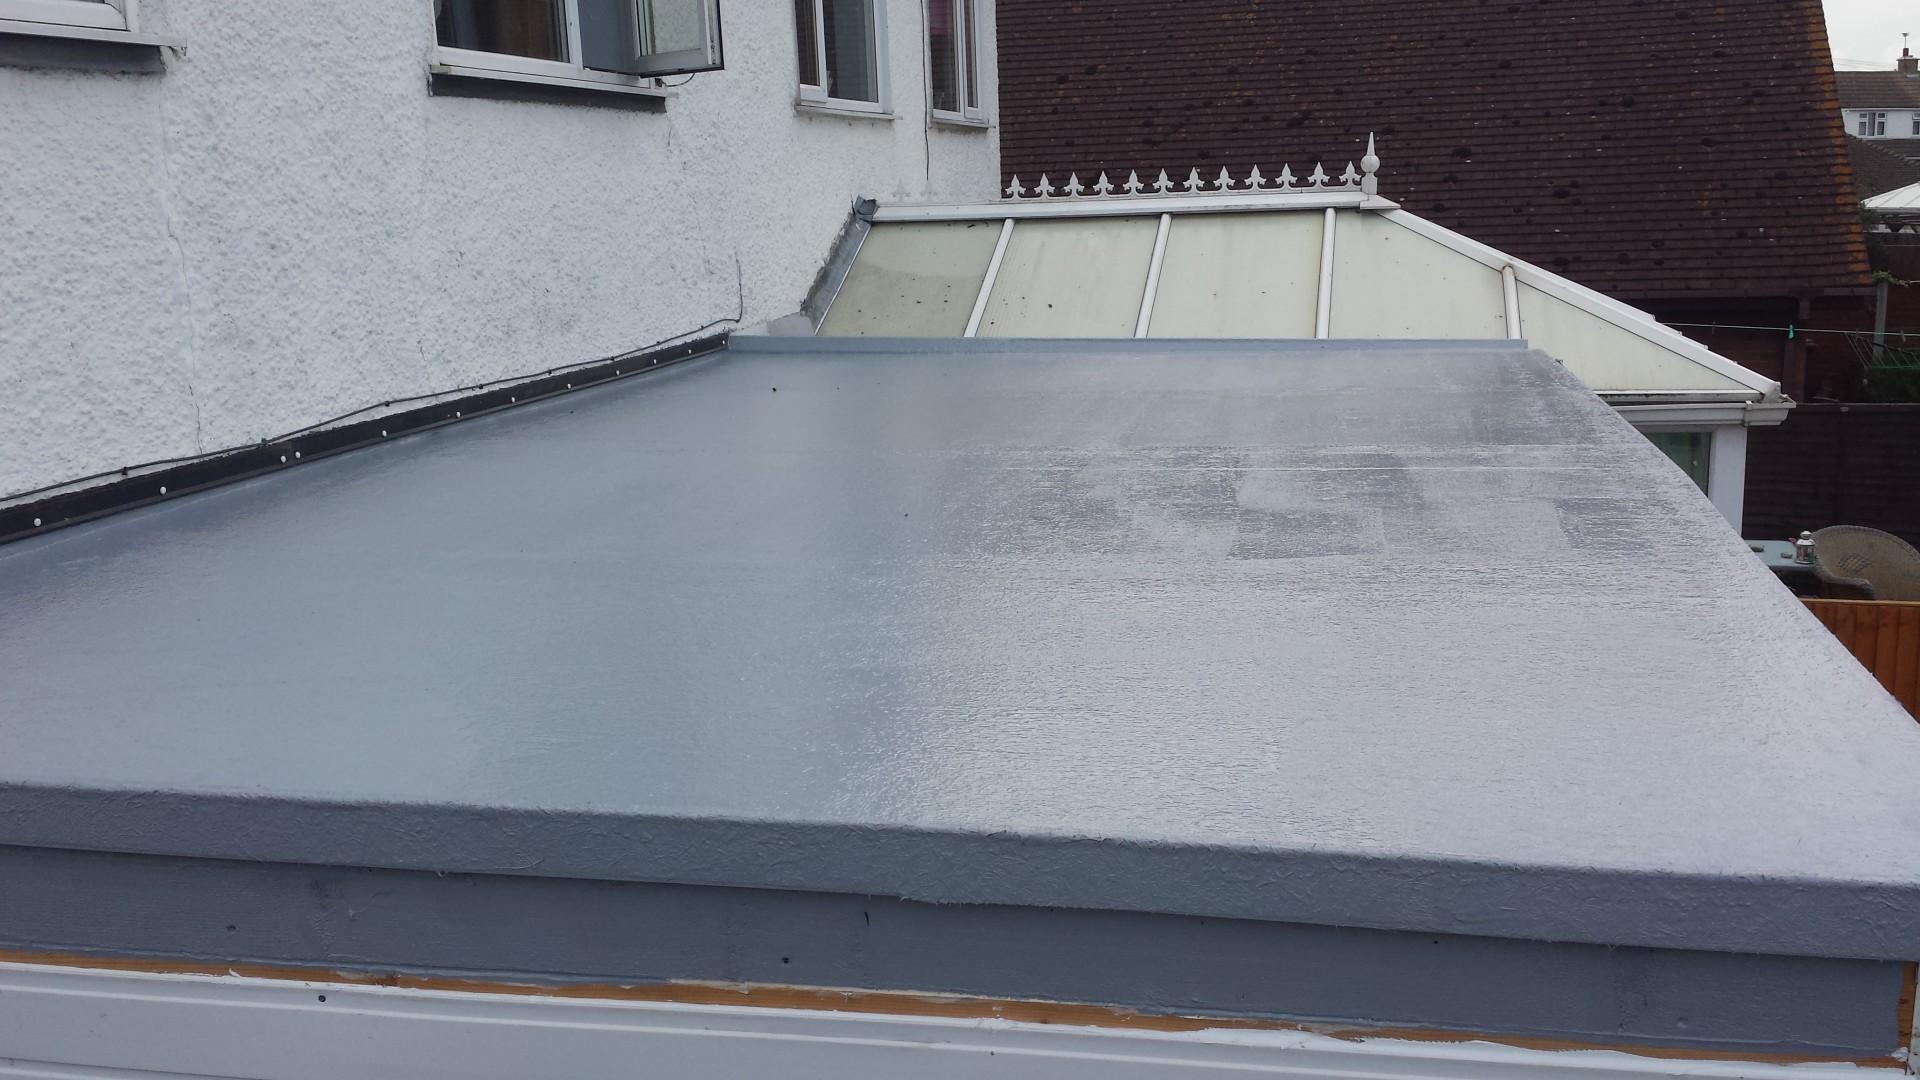 Home kent flat roofing brett ives kent flat roofing liquid plastic fiberglass reinforced specialists sciox Gallery